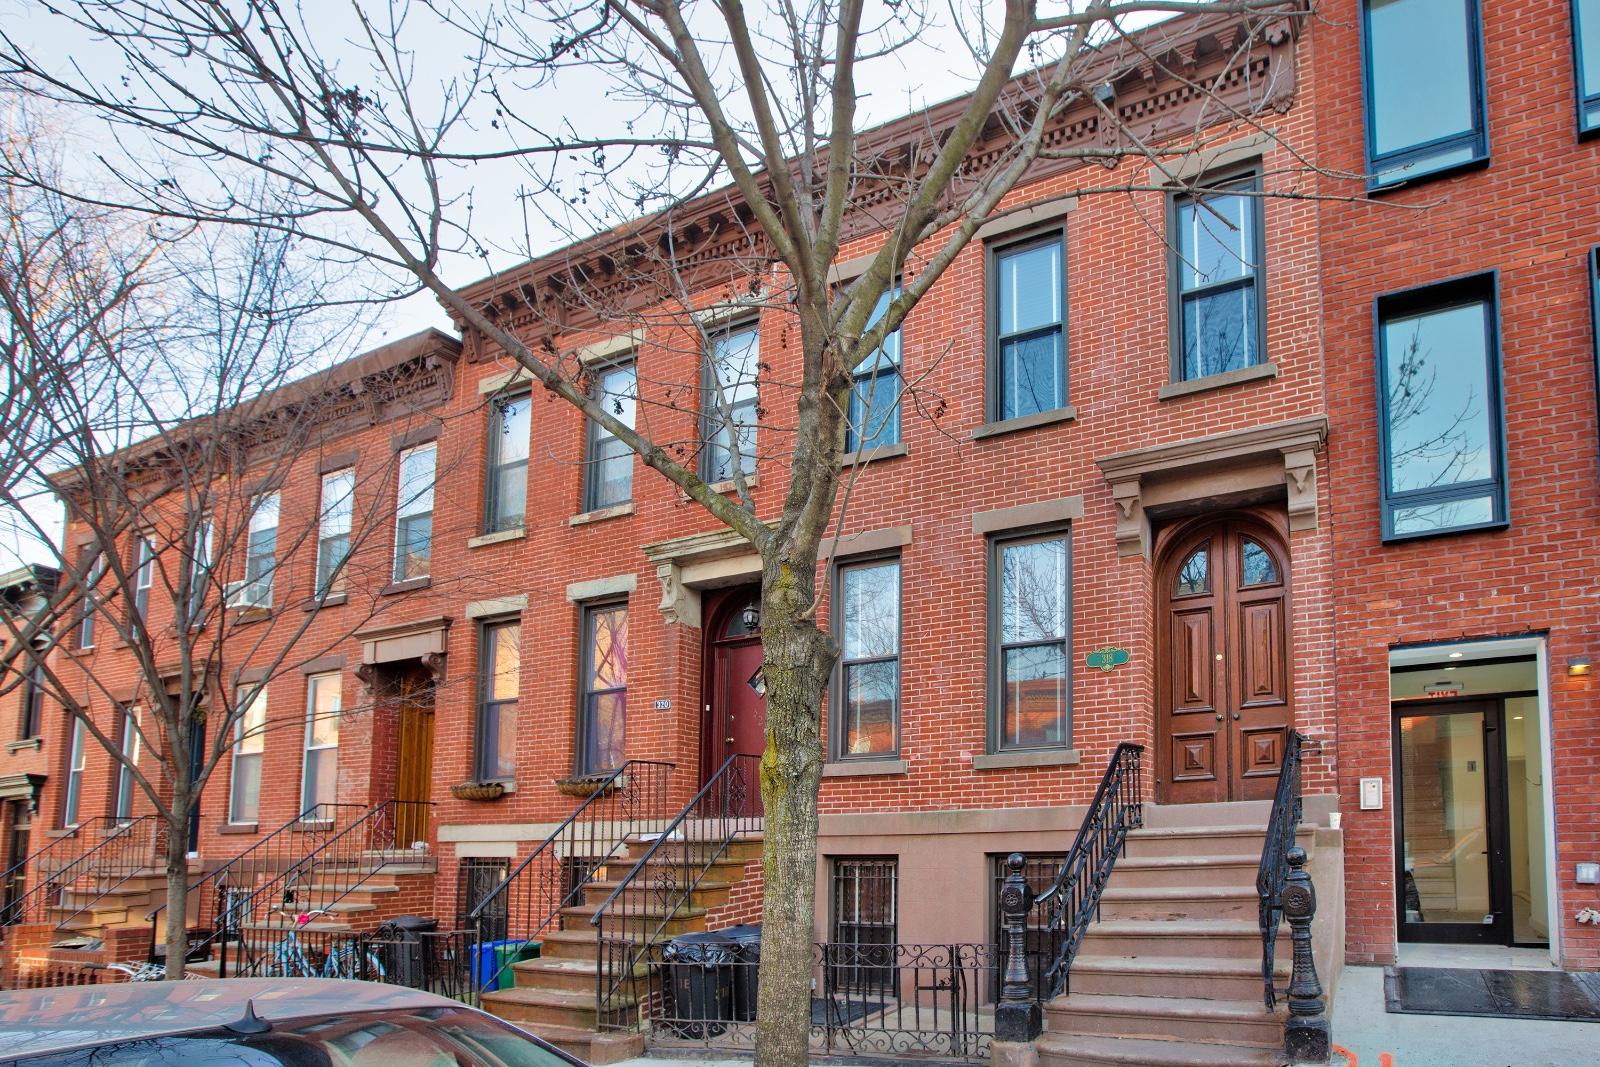 318 Carroll Street, Apt 2, Brooklyn, New York 11231